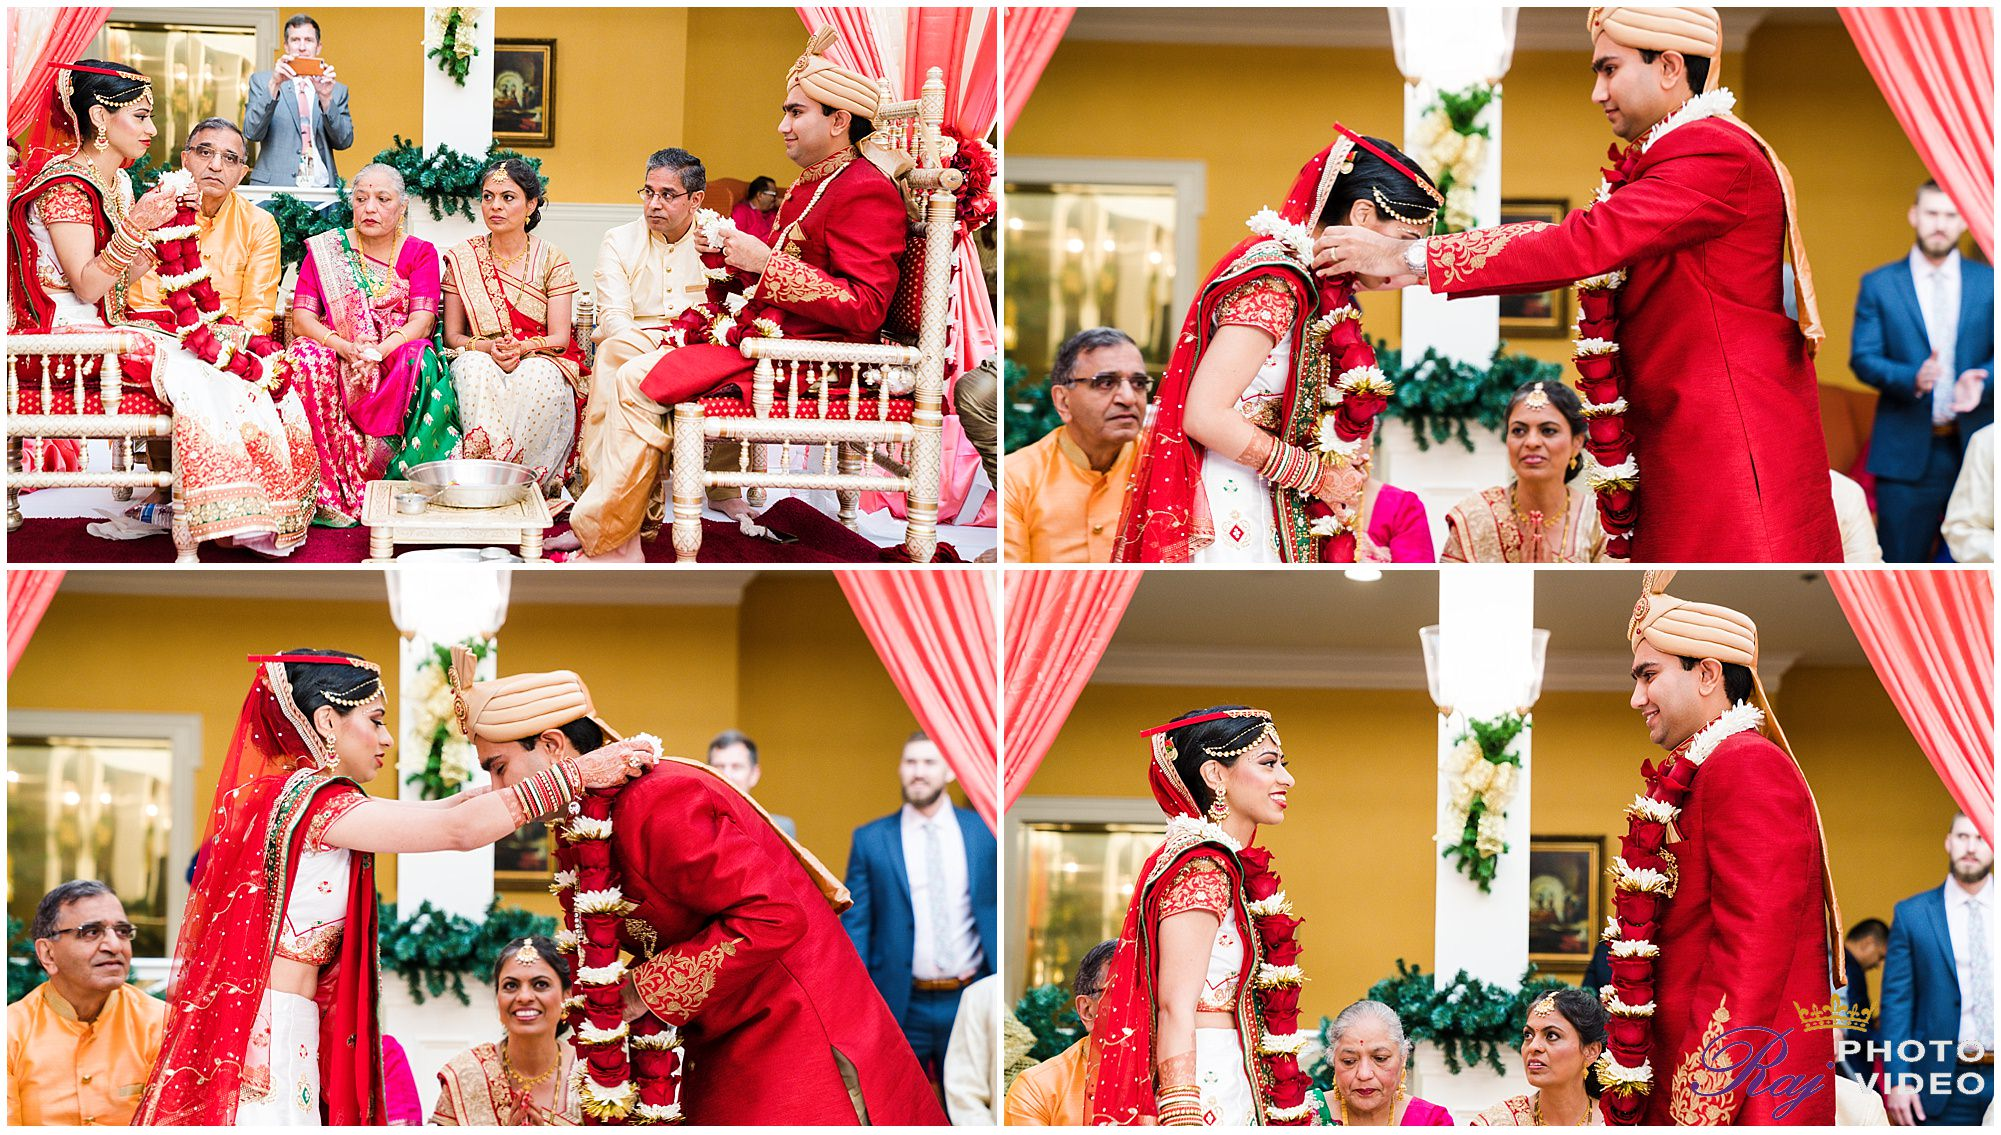 Founders-Inn-and-Spa-Virginia-Beach-VA-Indian-Wedding-Harini-Vivek-36.jpg